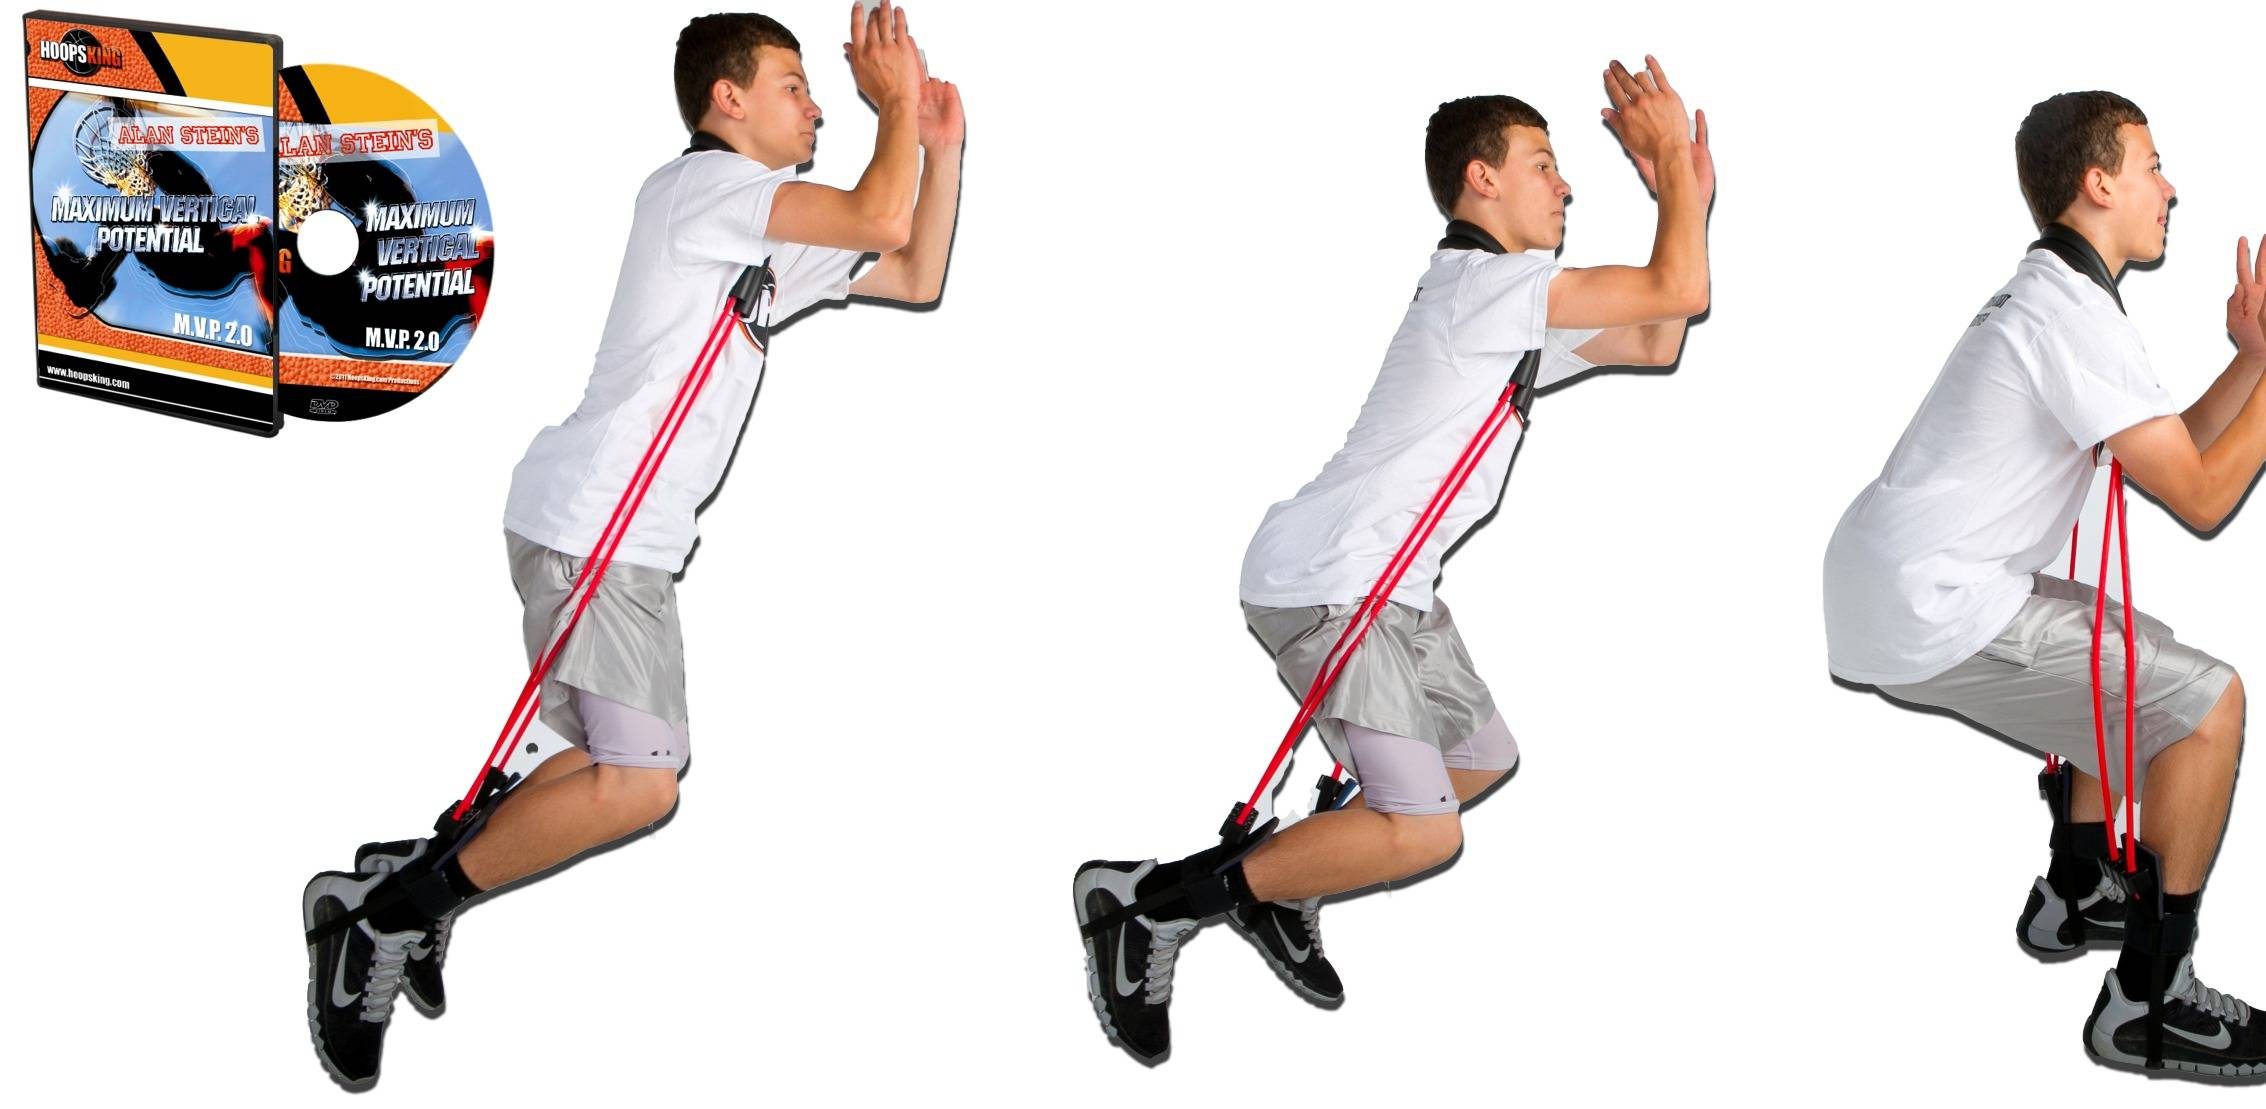 vertical jump training aids